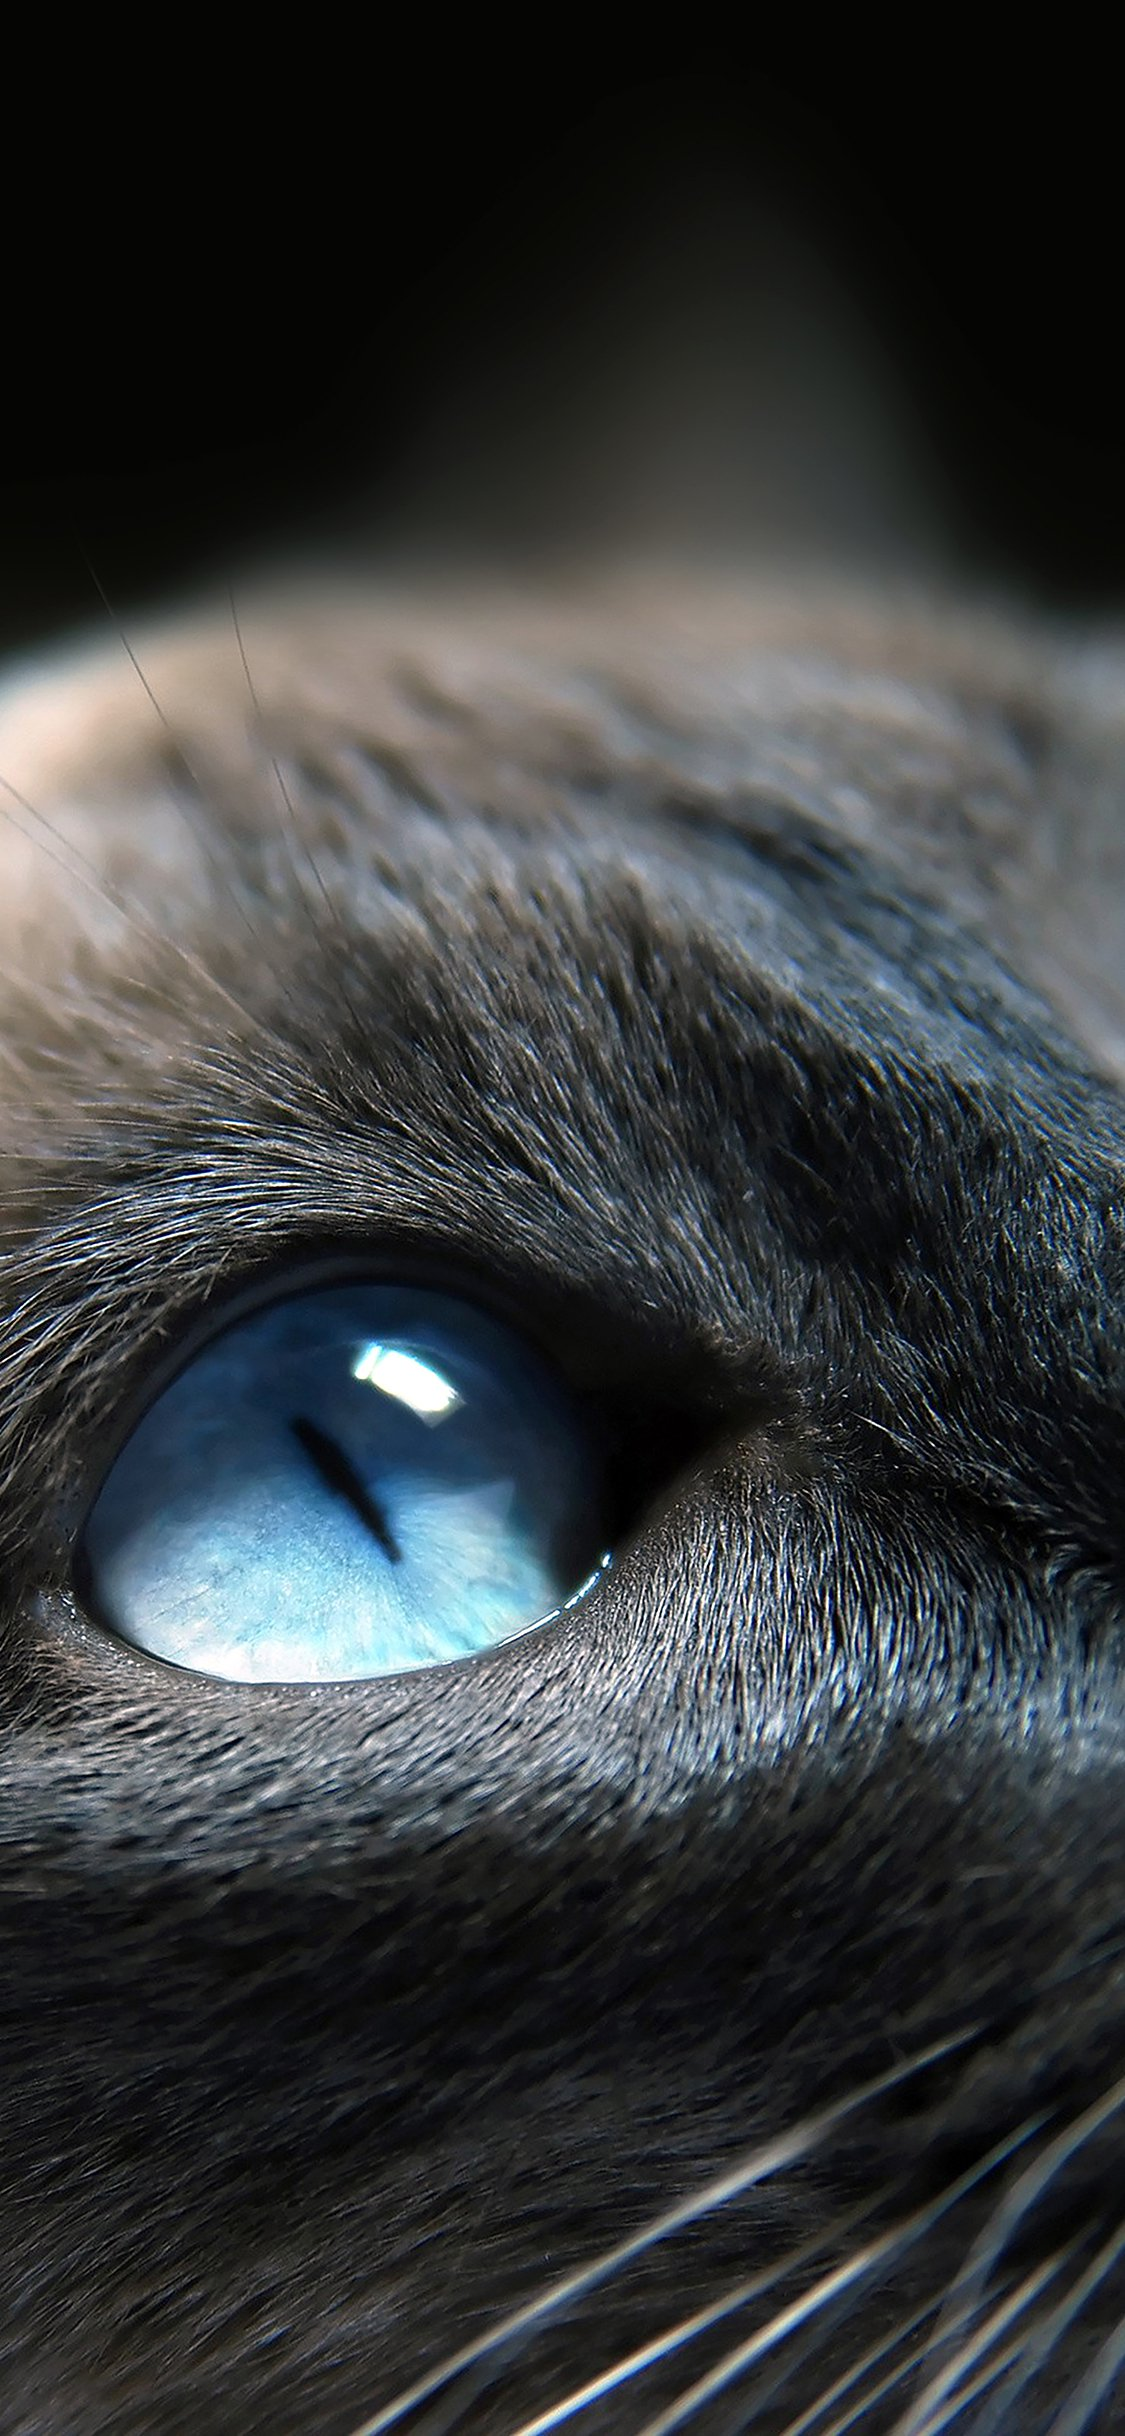 Movie Wallpaper Iphone Wallpaper Eyes